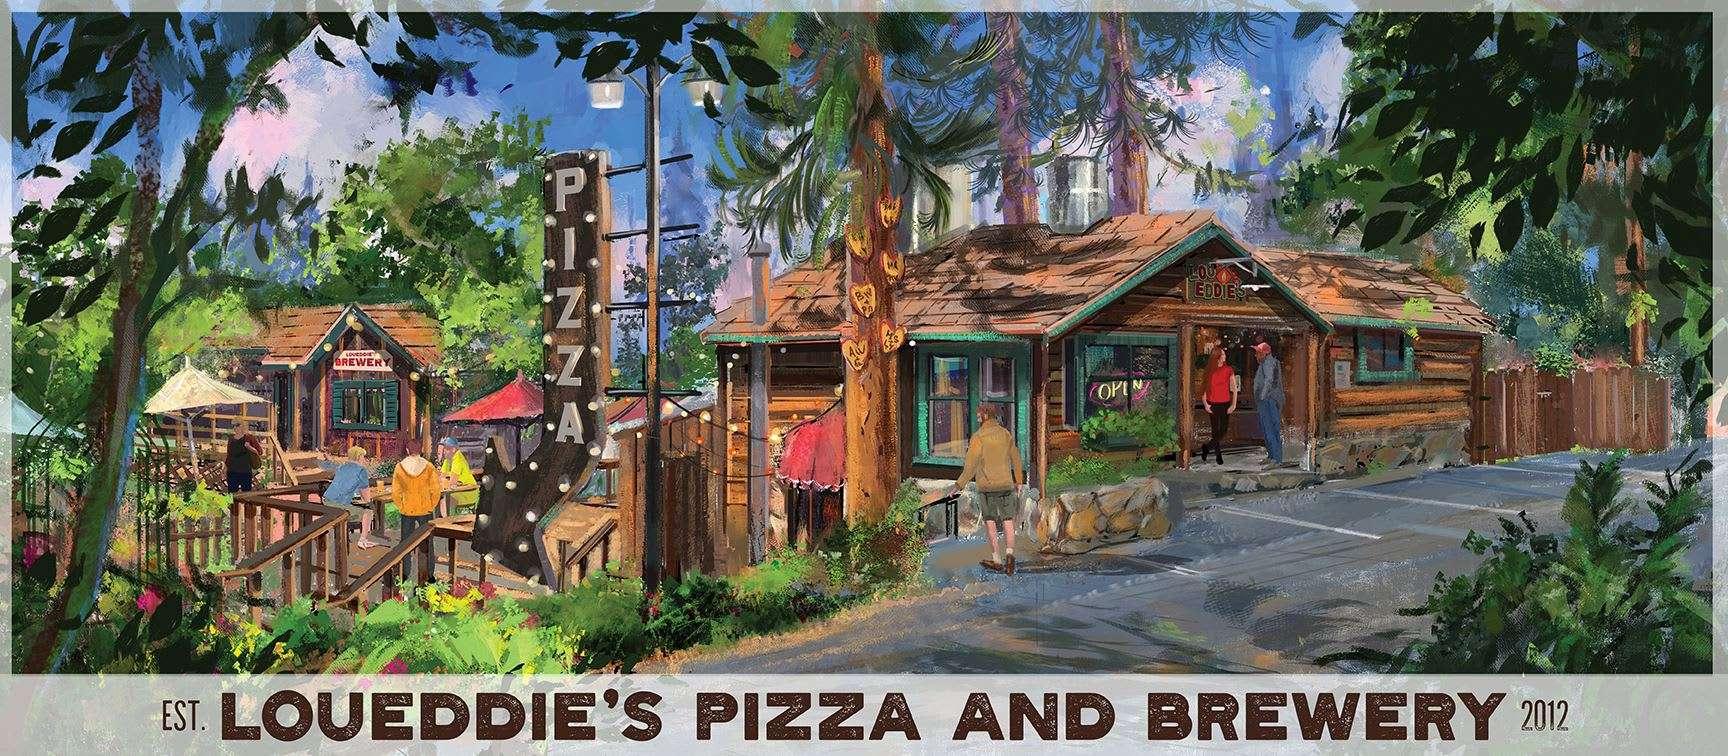 Lou Eddies Pizza